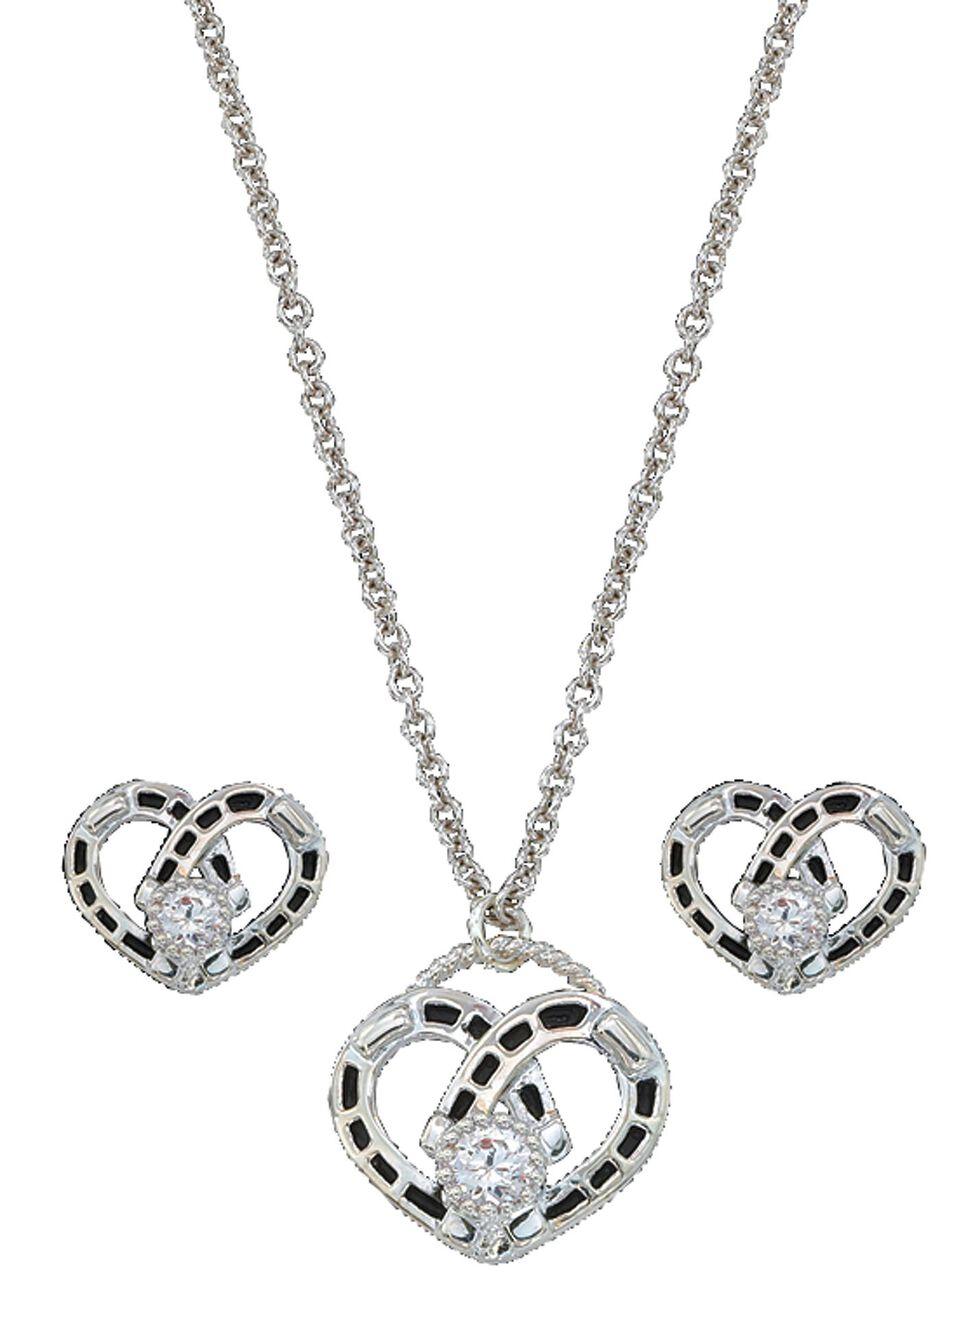 Montana Silversmiths Horseshoe Heart Necklace & Earrings Set, Silver, hi-res